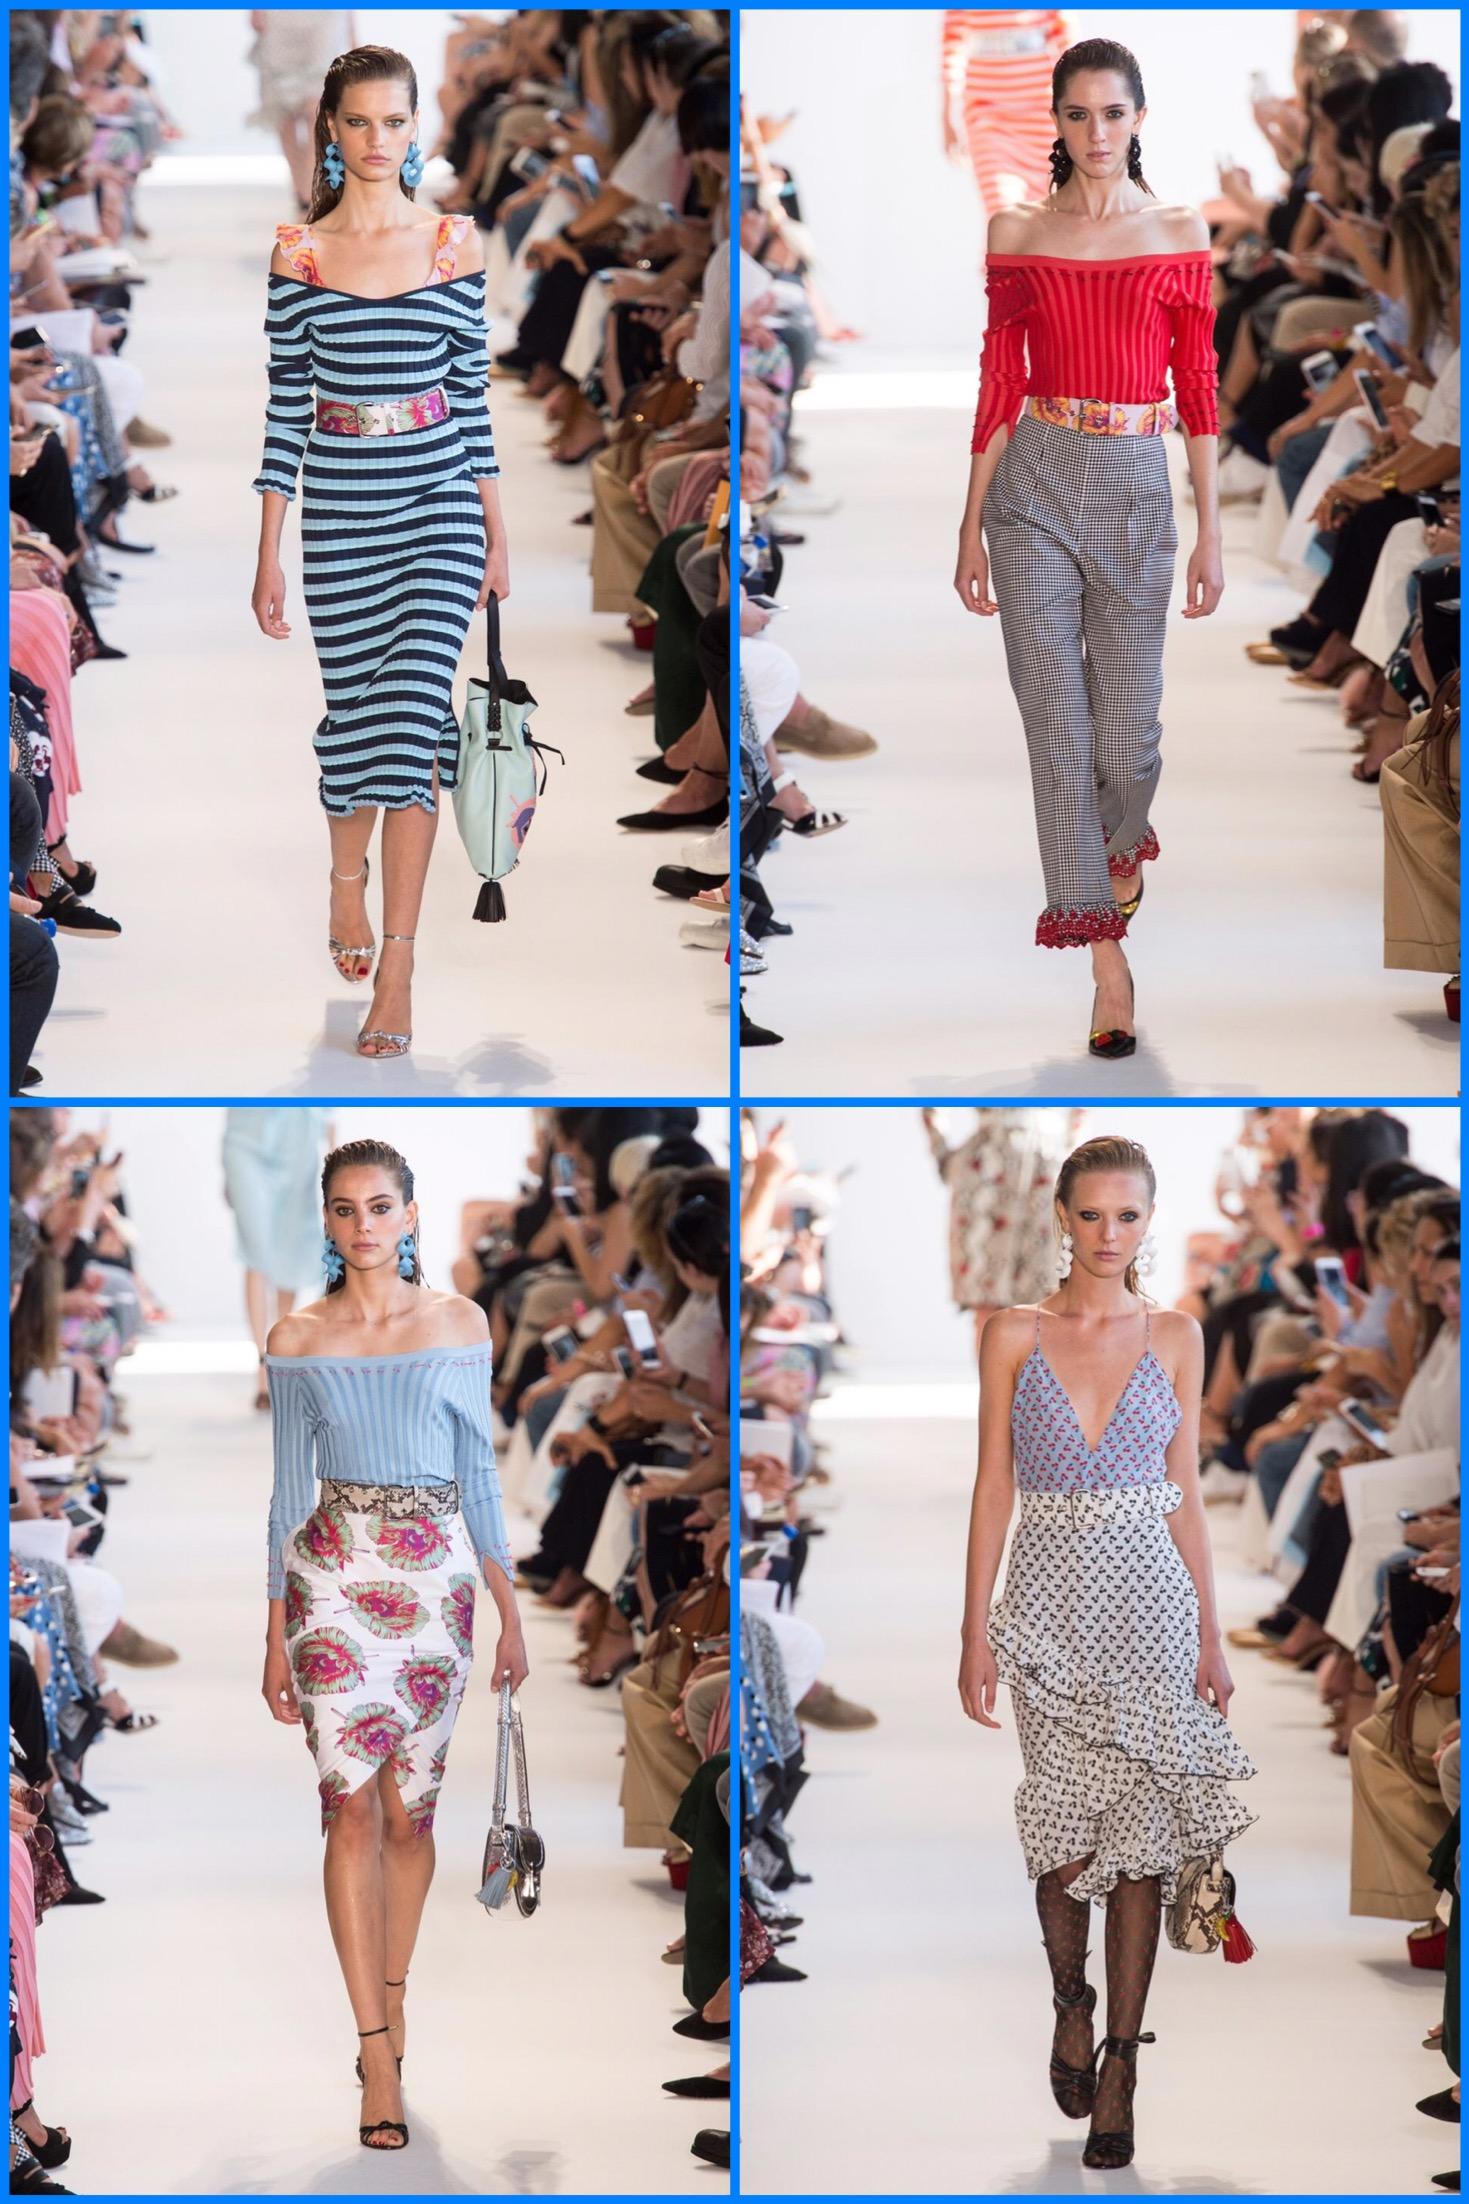 new-york-fashion-week-pret-a-porter-spring-summer-2017-style-altuzarra